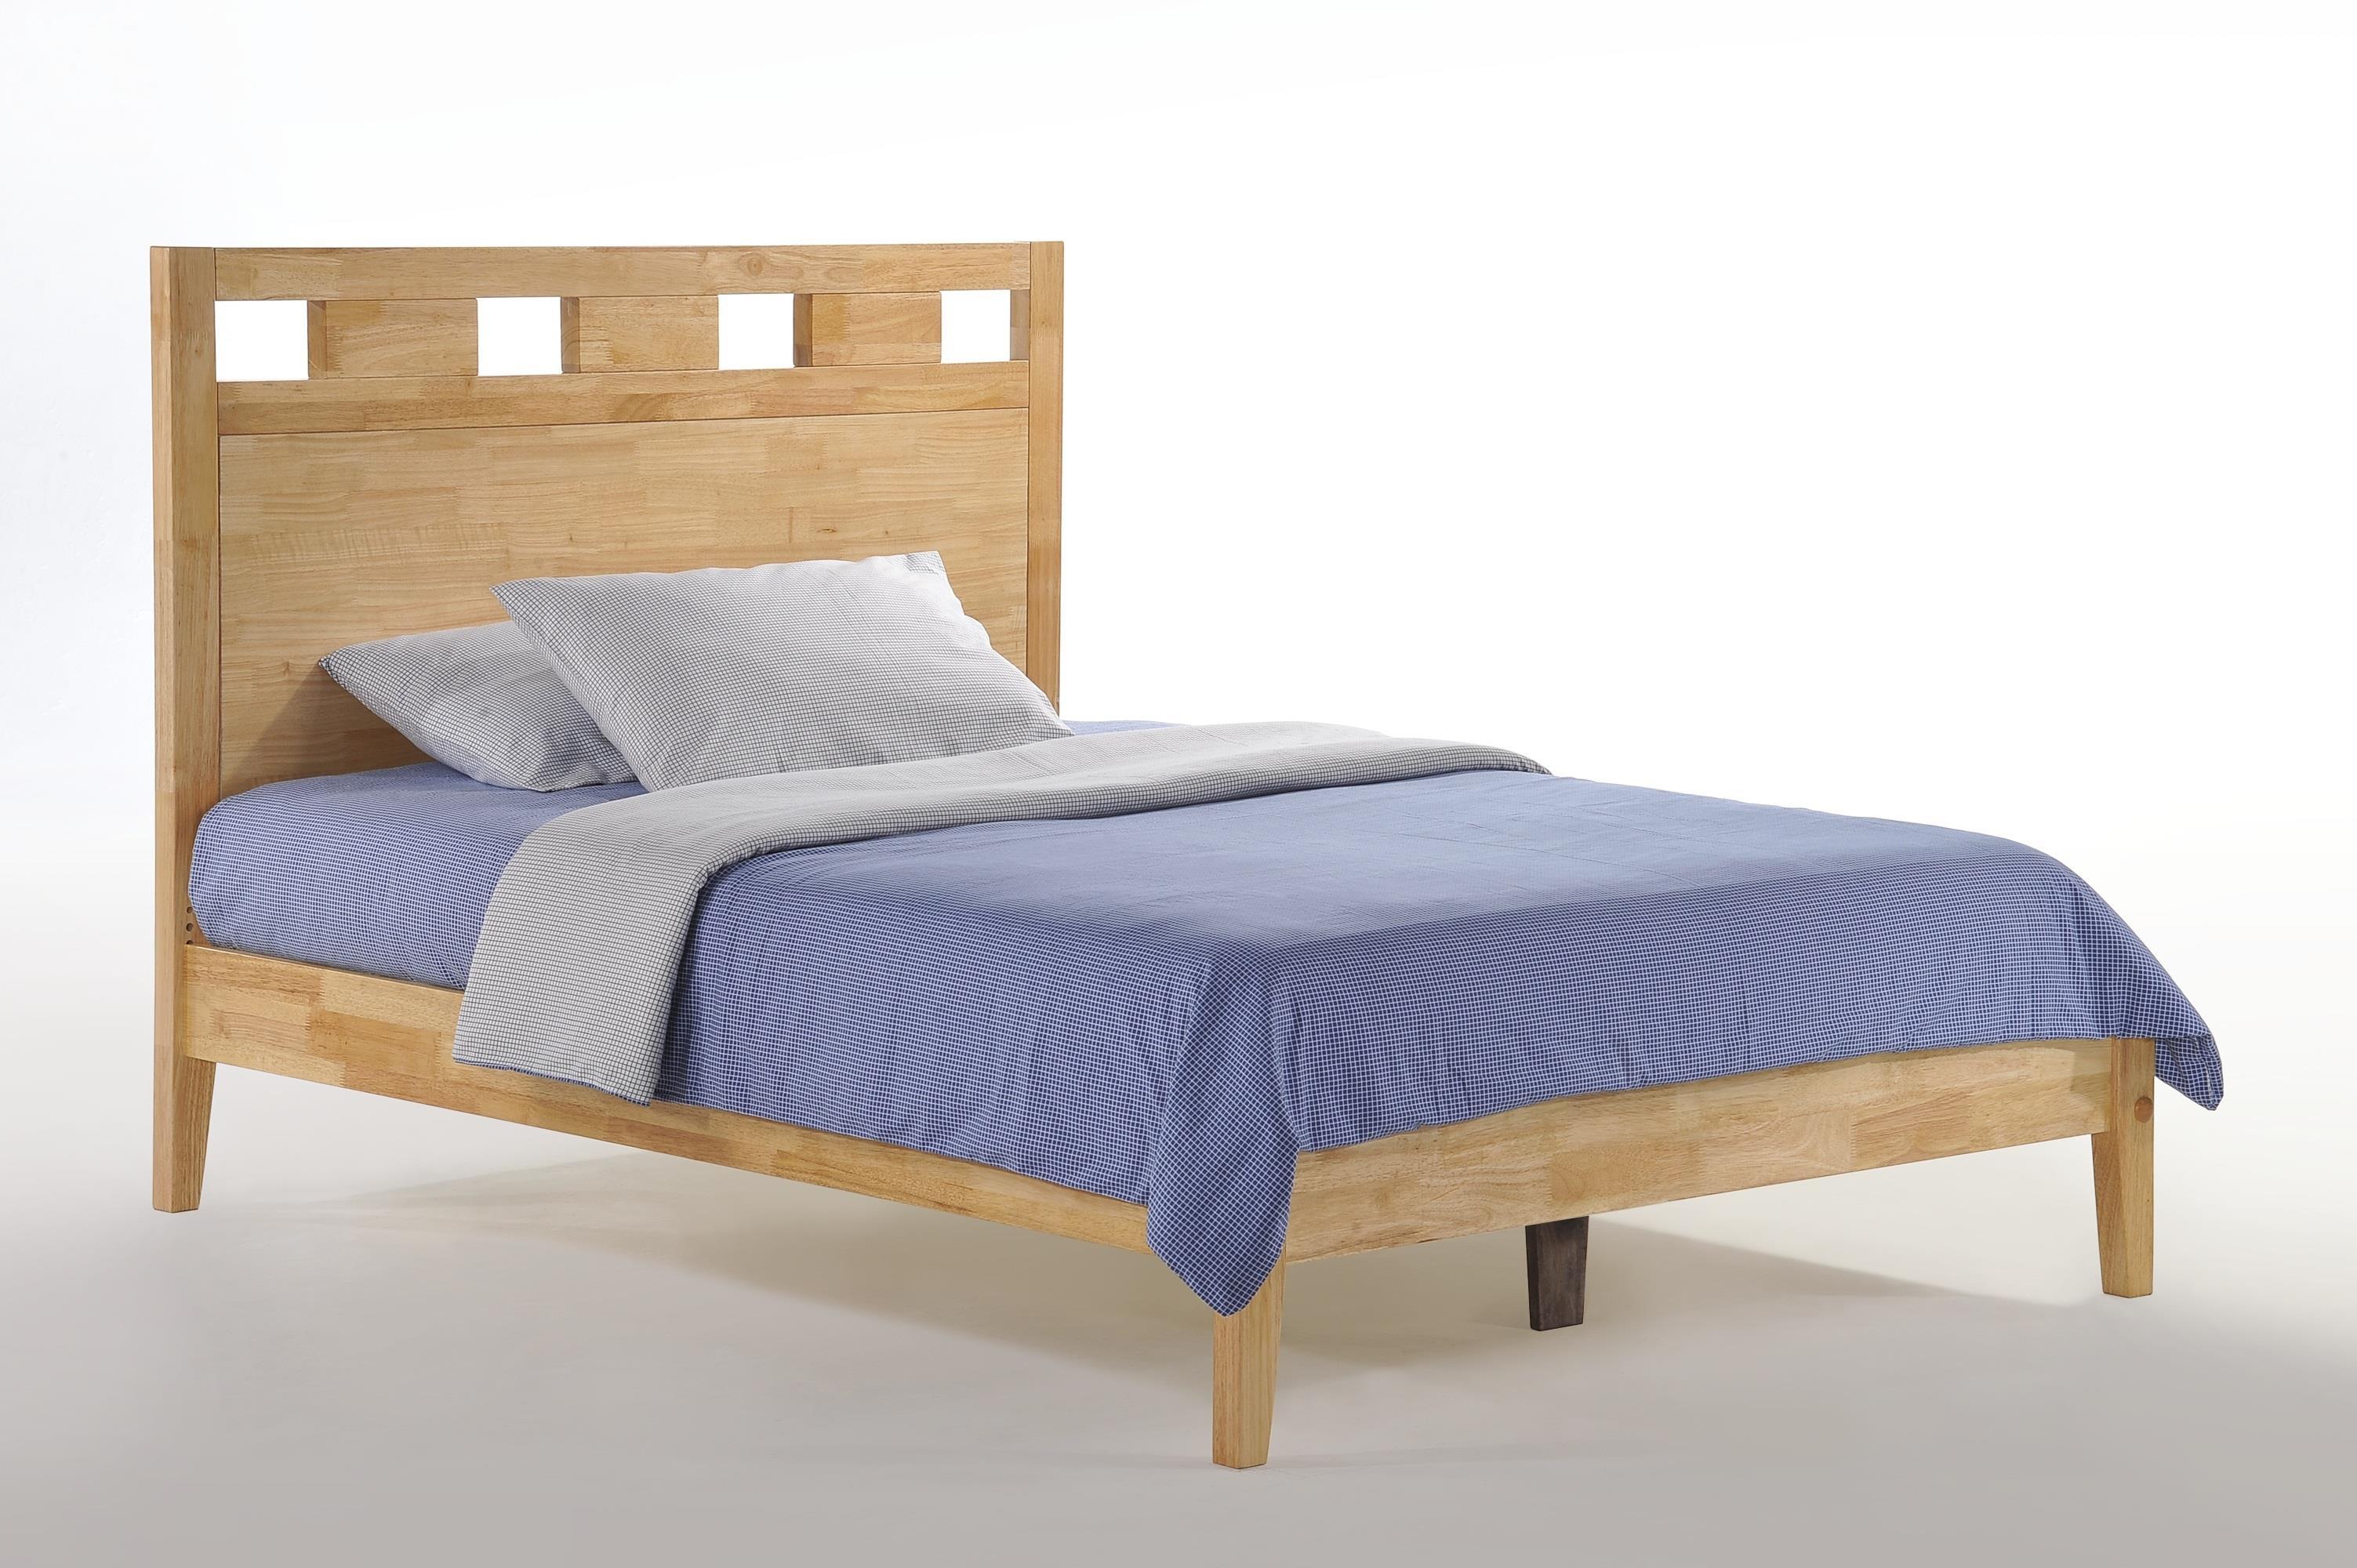 Tamarind Cal King Bed by Pacific Manufacturing at SlumberWorld